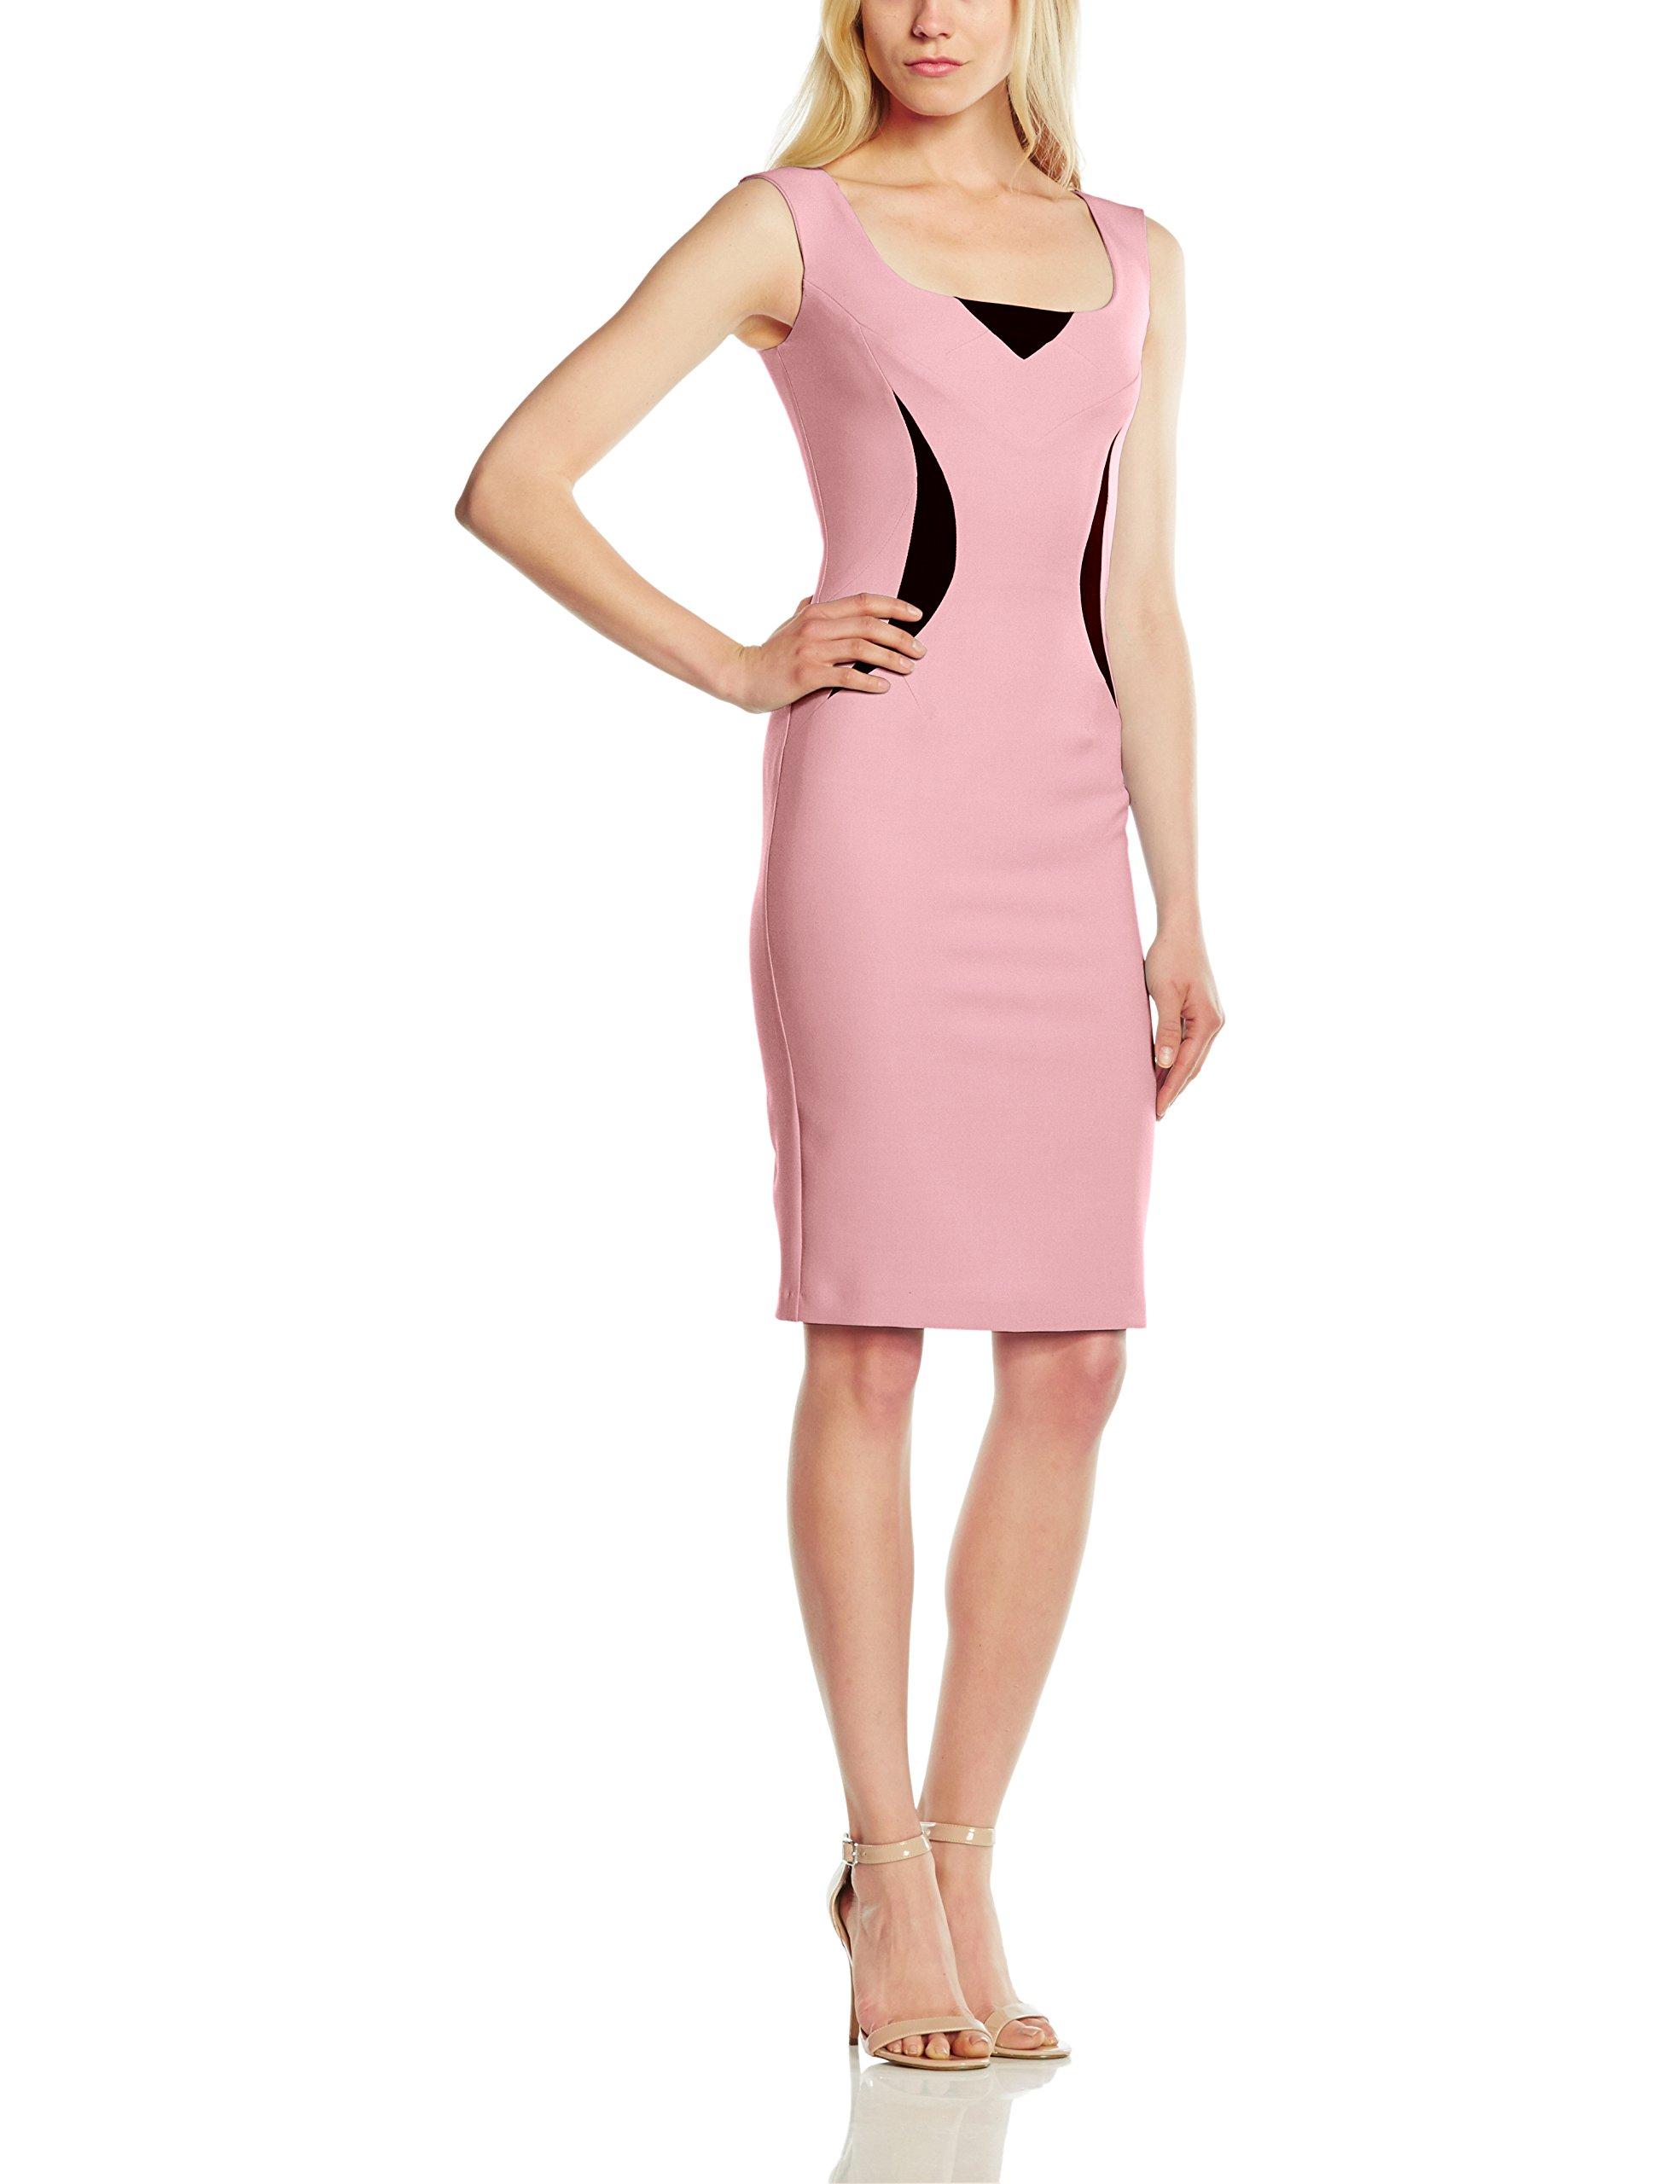 FemmeRosa ElviraRobe Manches Moulante Courtes Pinkbaby Pink44 Hybrid 901 rBxWQoedC